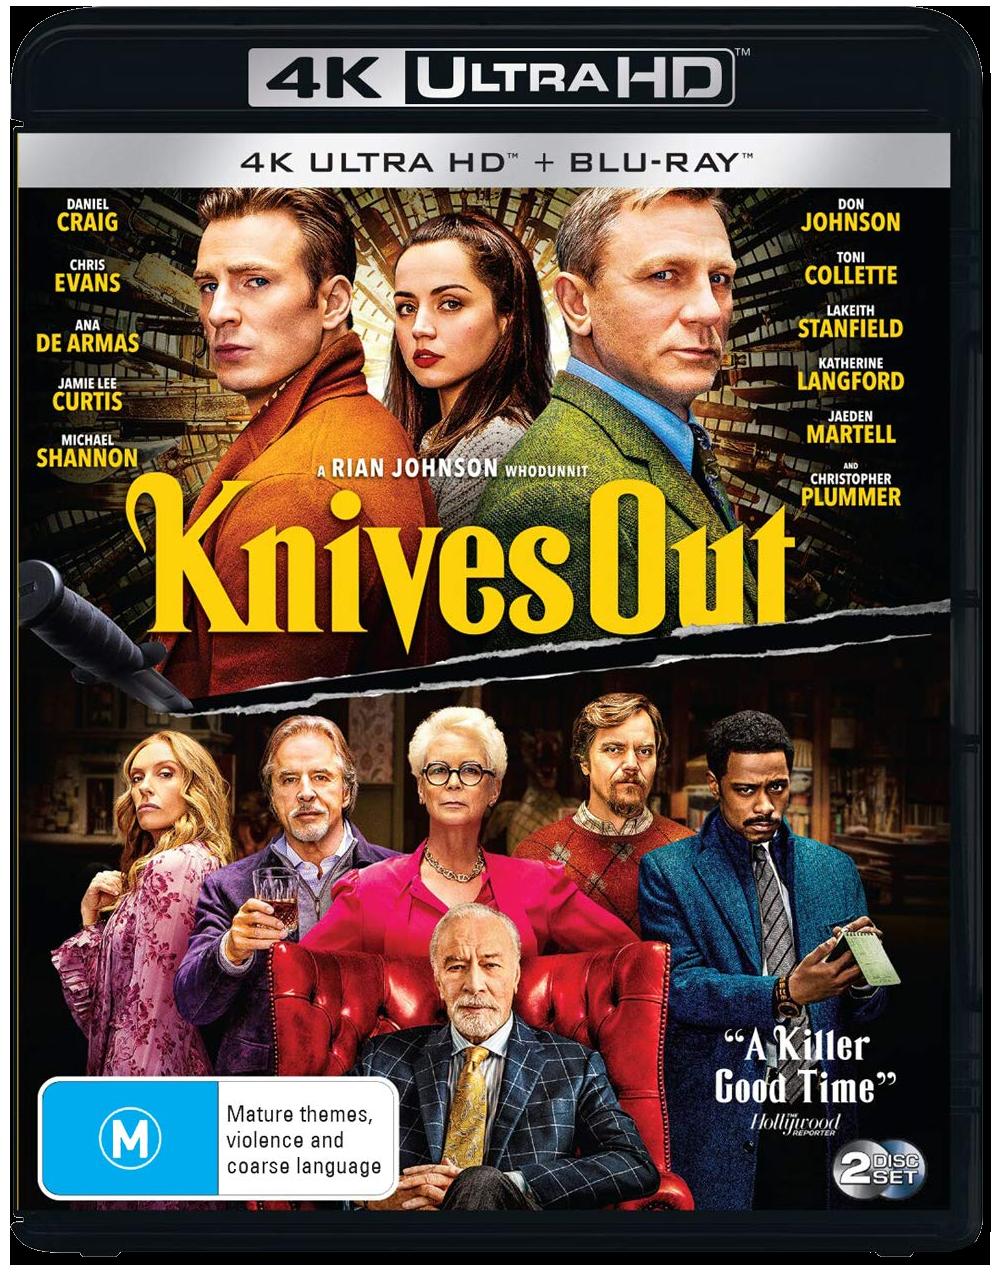 KnivesOut-4KUHD.fw